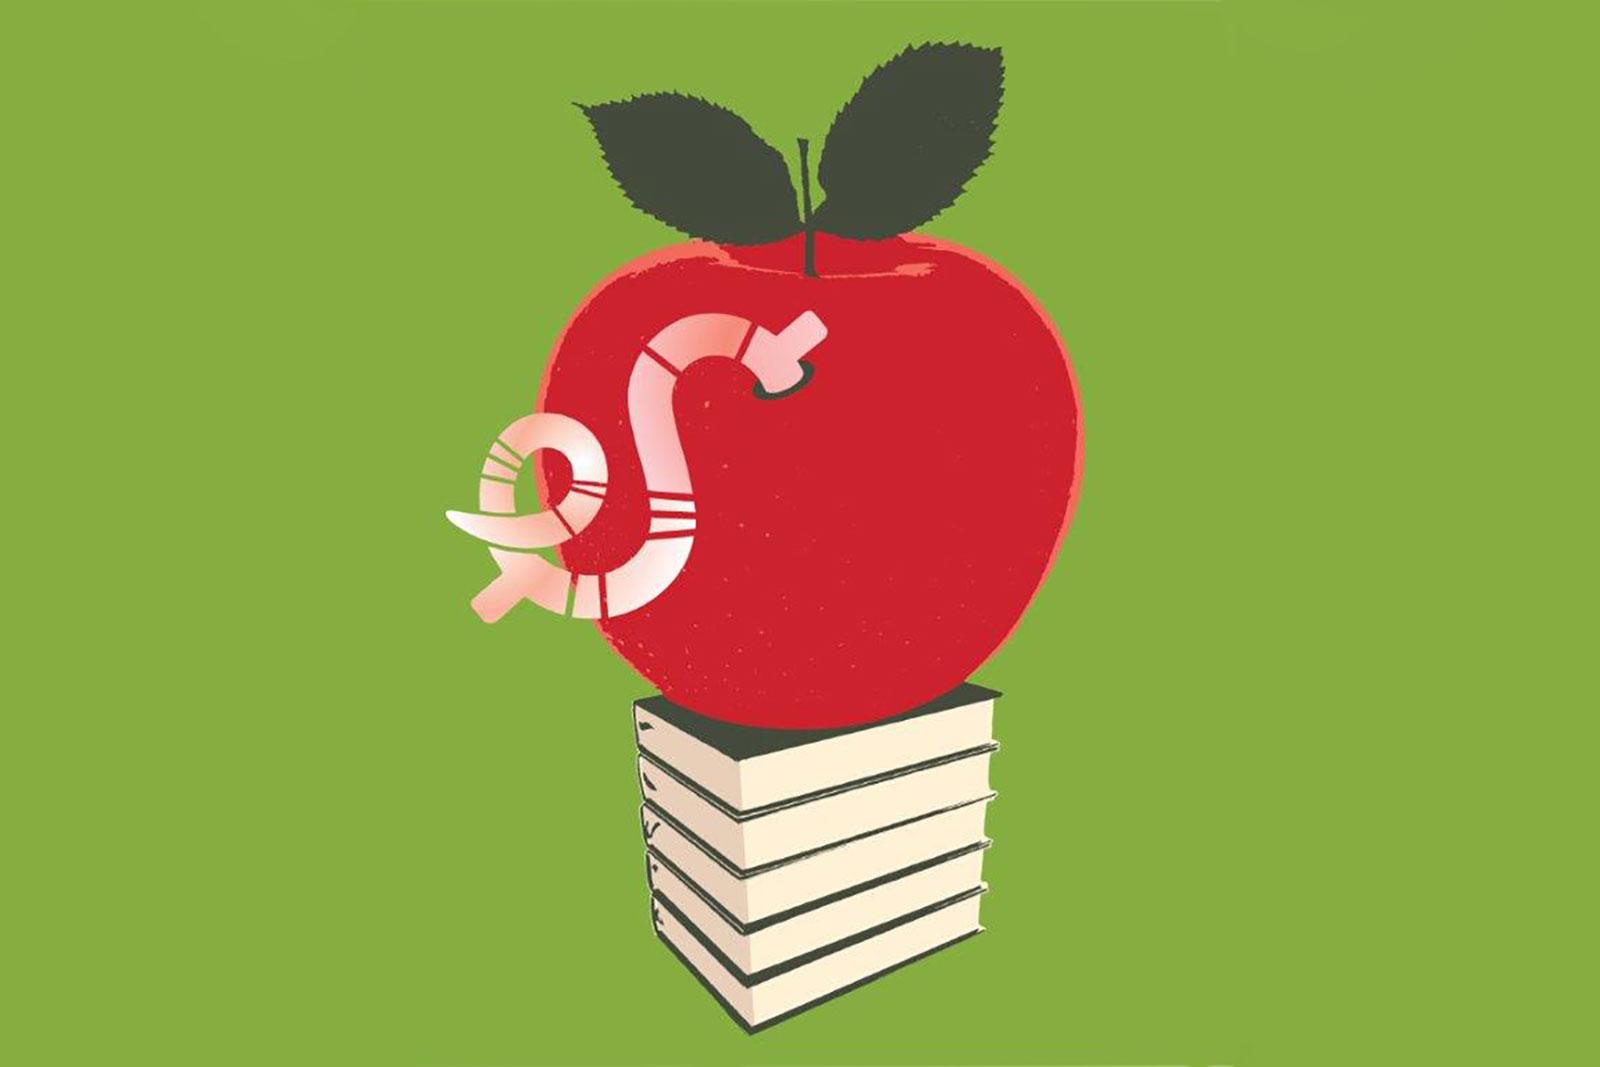 Apple Illustration (Getty Images)